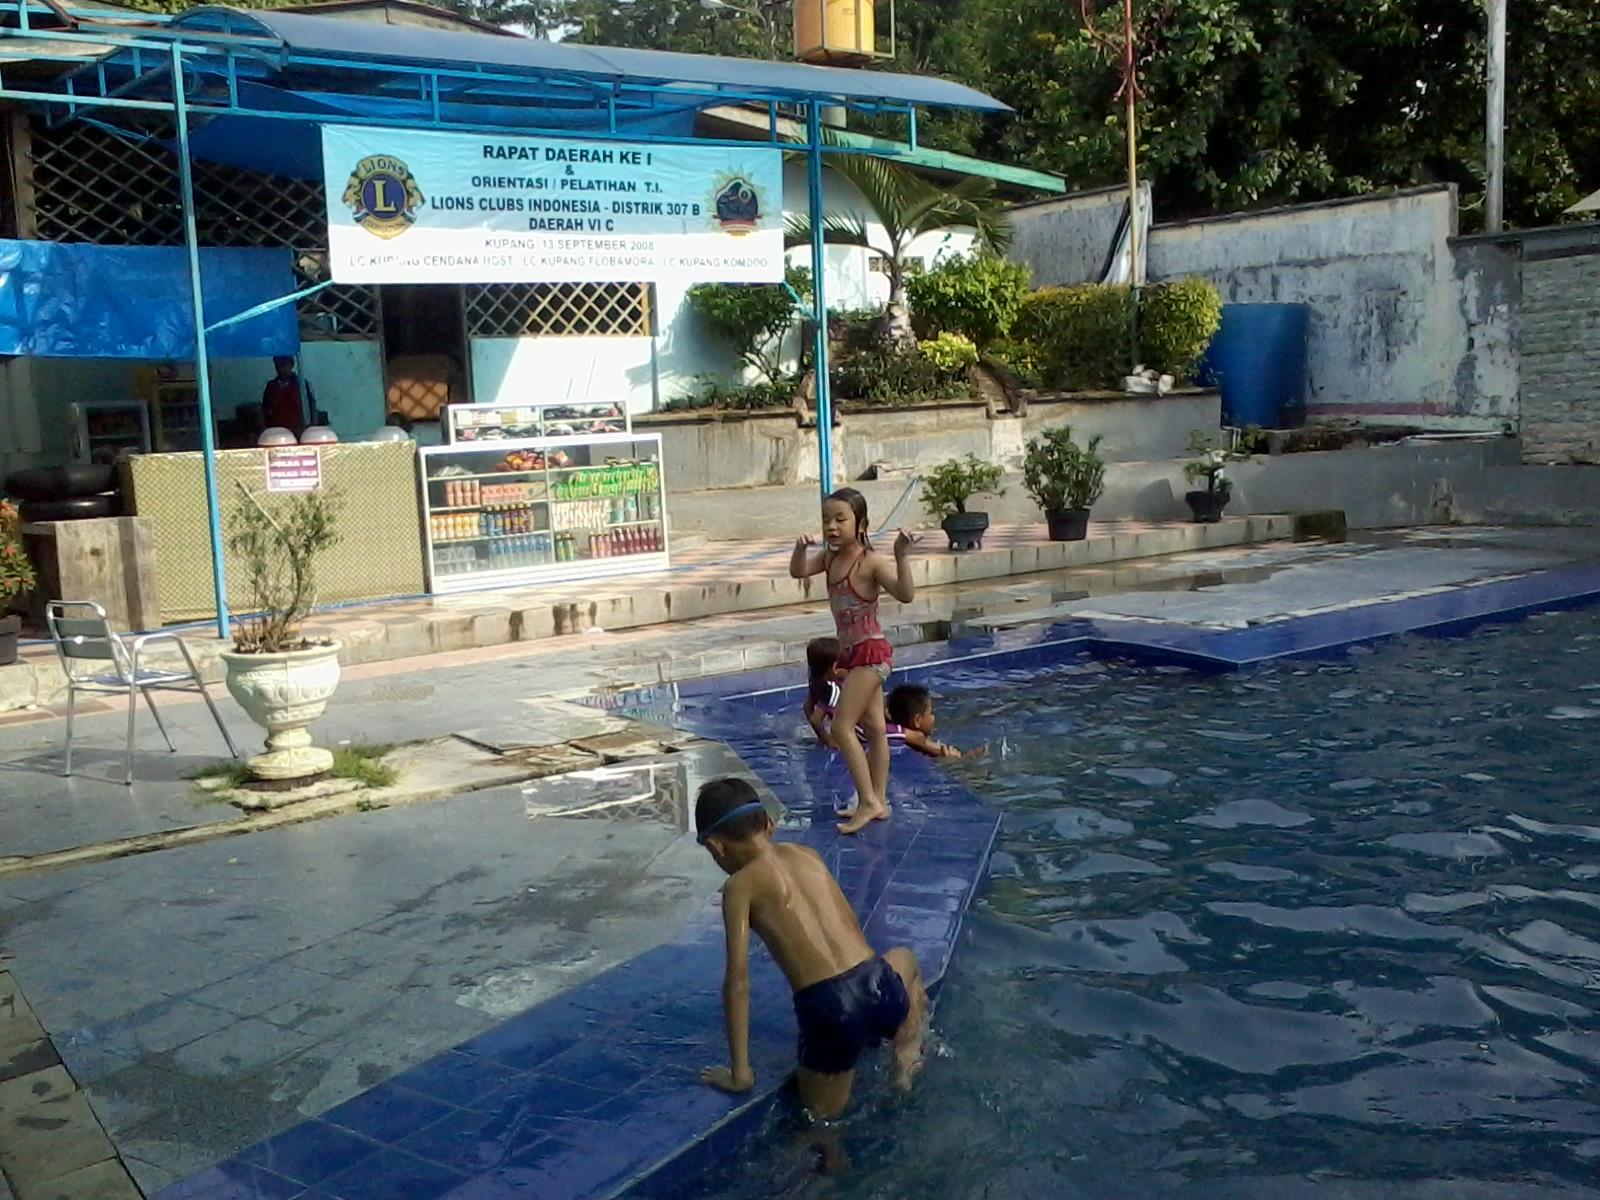 Kolam Renang Wiraksakti Kupang Ntt Haidi Barasa 2014 02 09